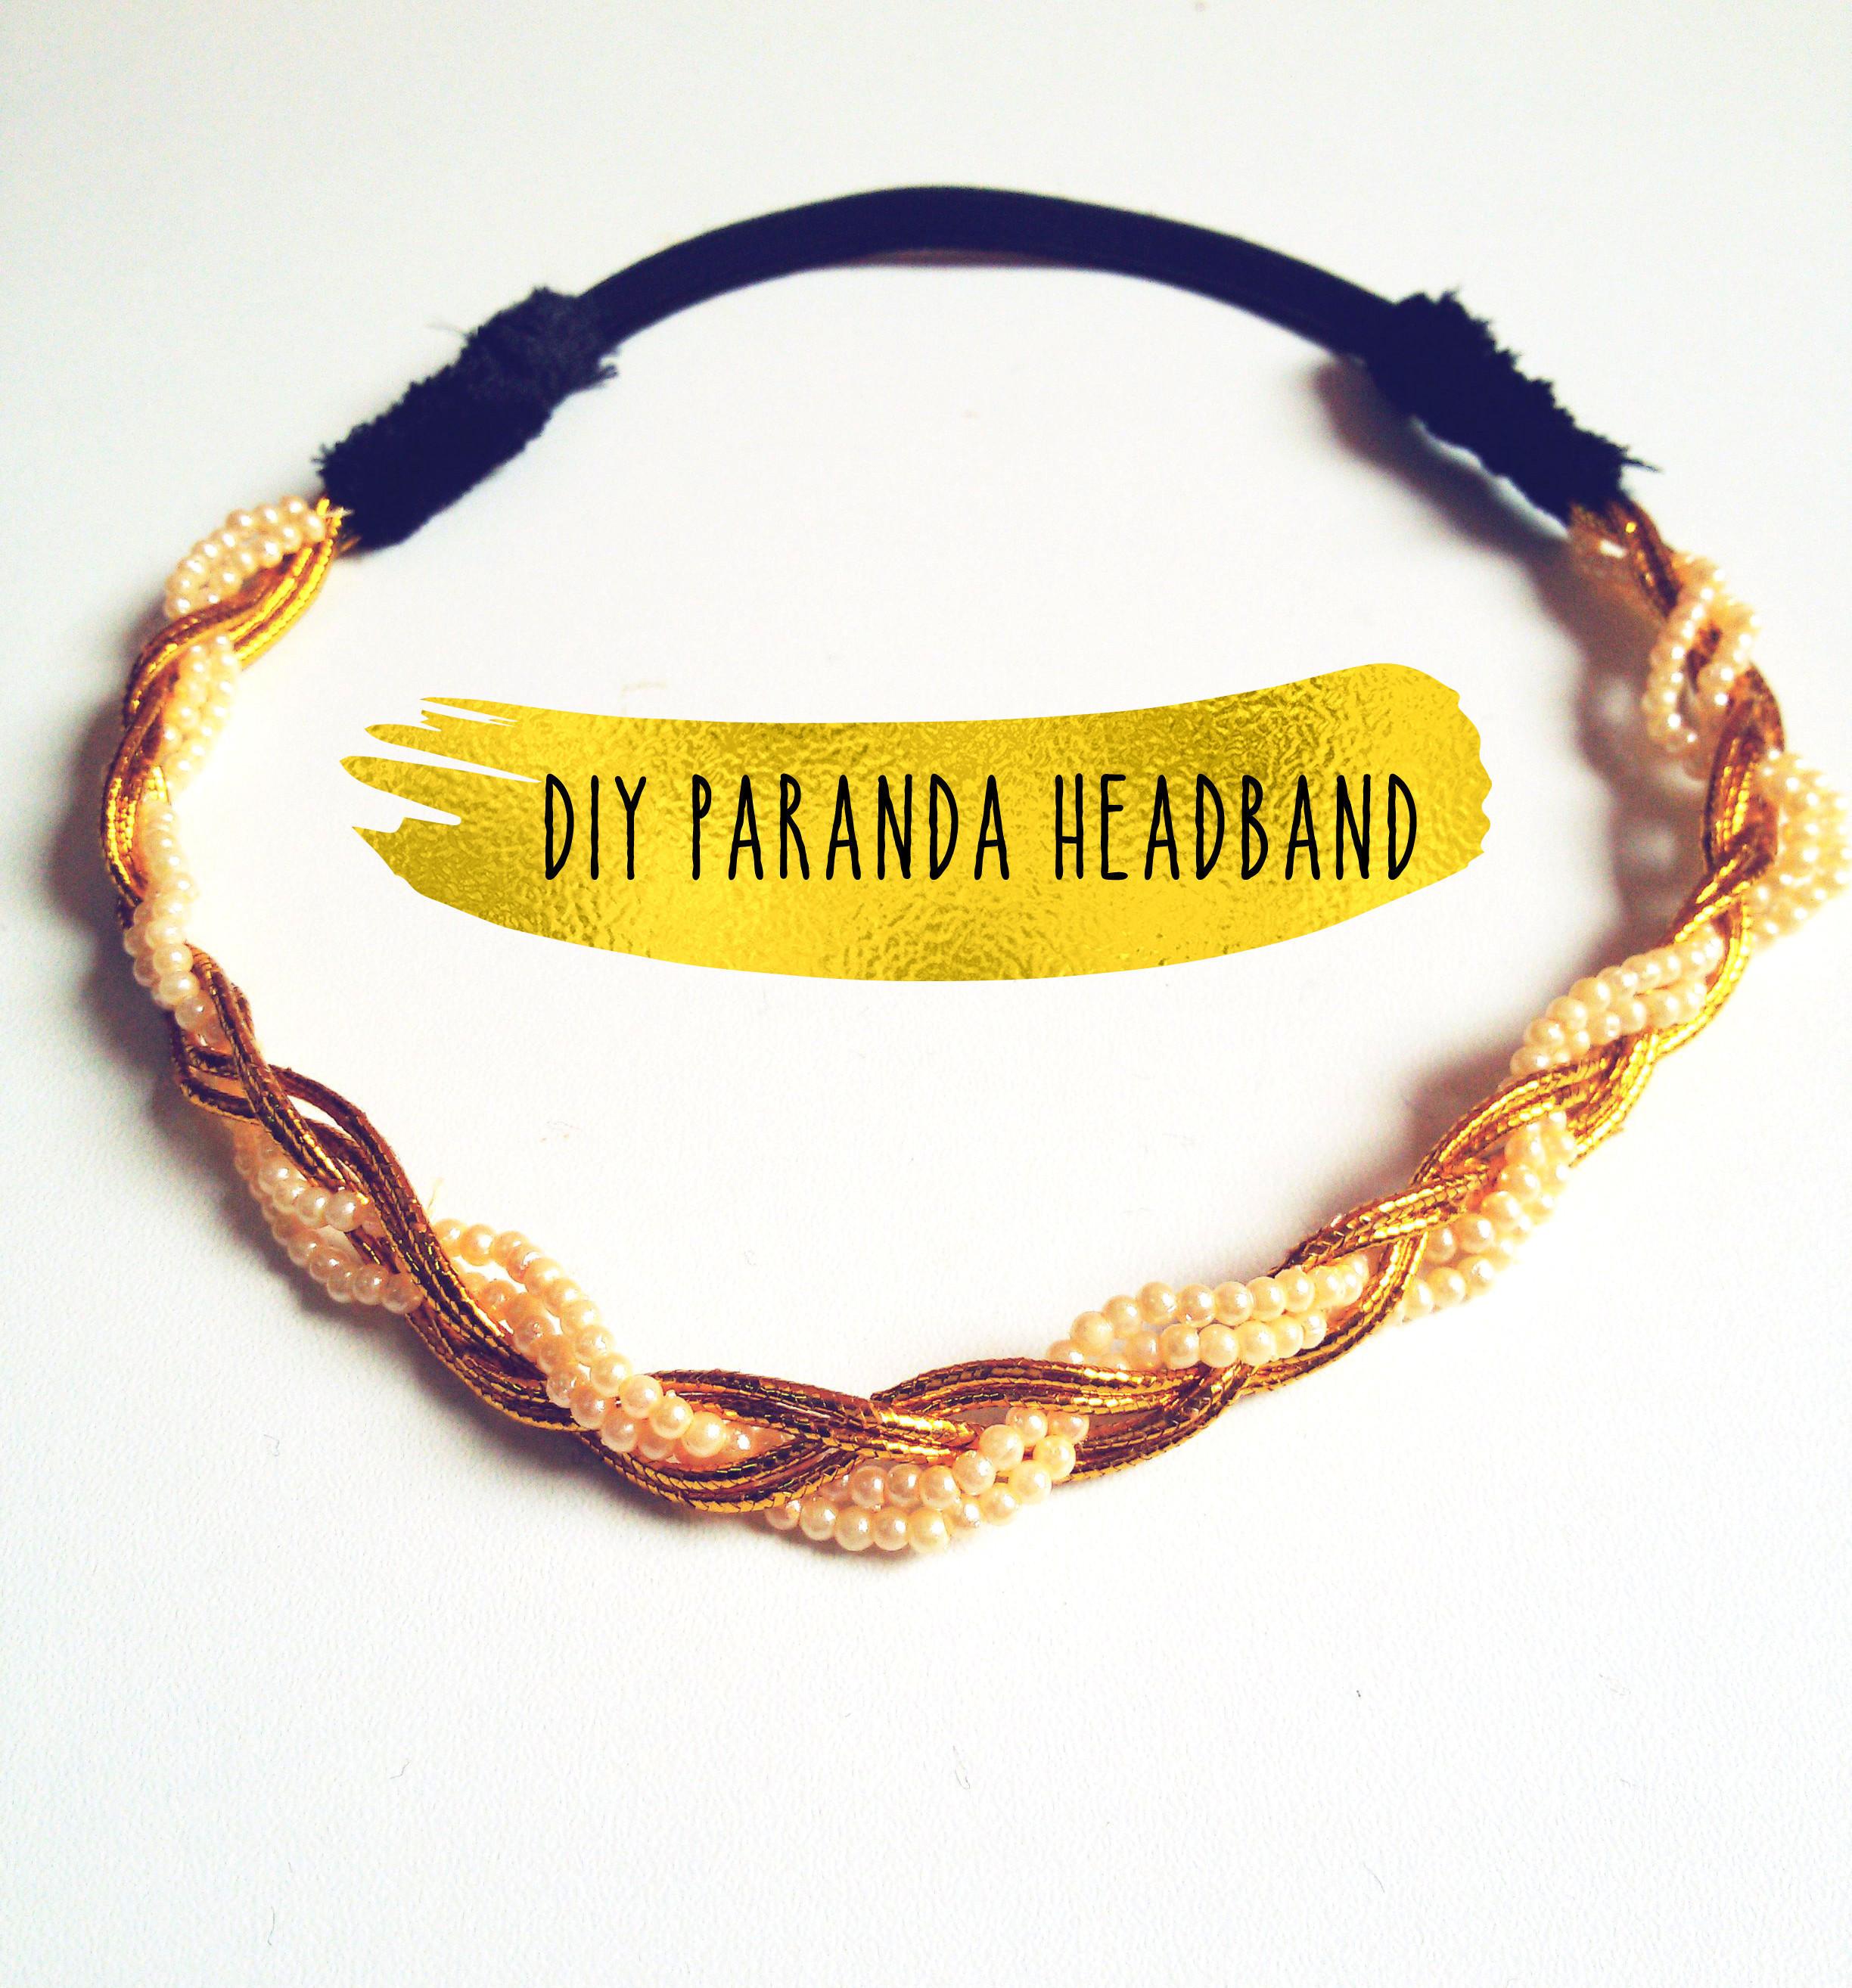 How to make hairbands headbands craft tutorials and inspiration diy paranda headband izmirmasajfo Gallery